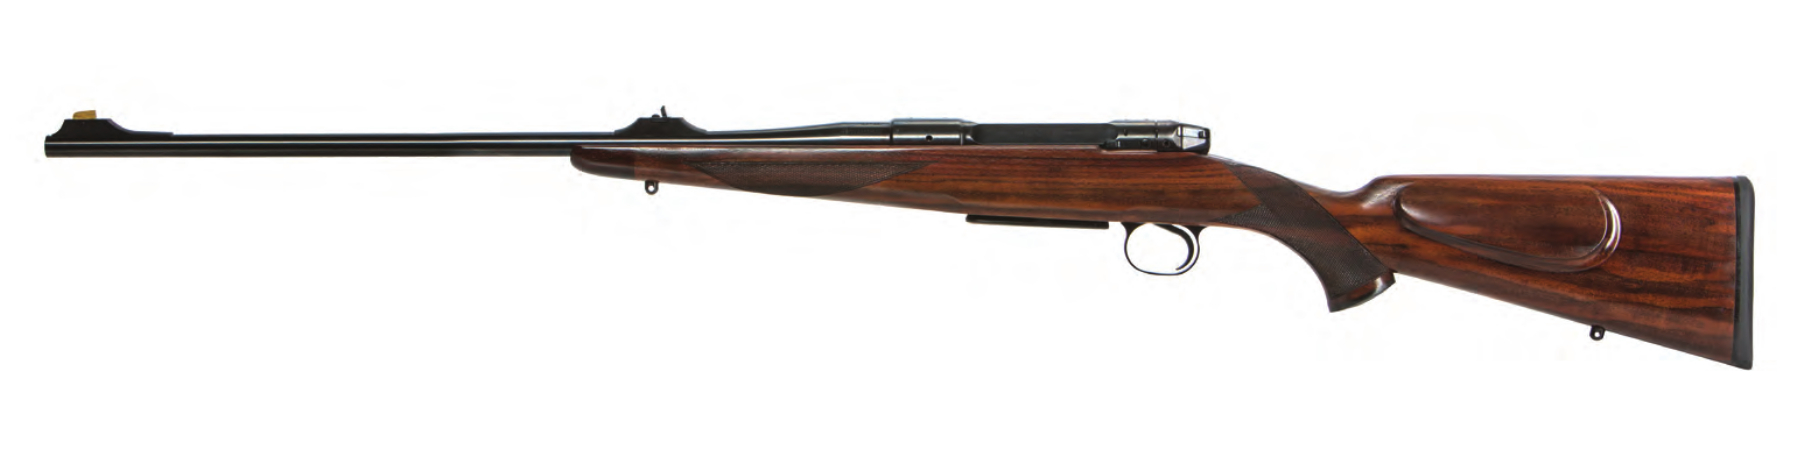 Heym SR30 straight pull bolt action rifle